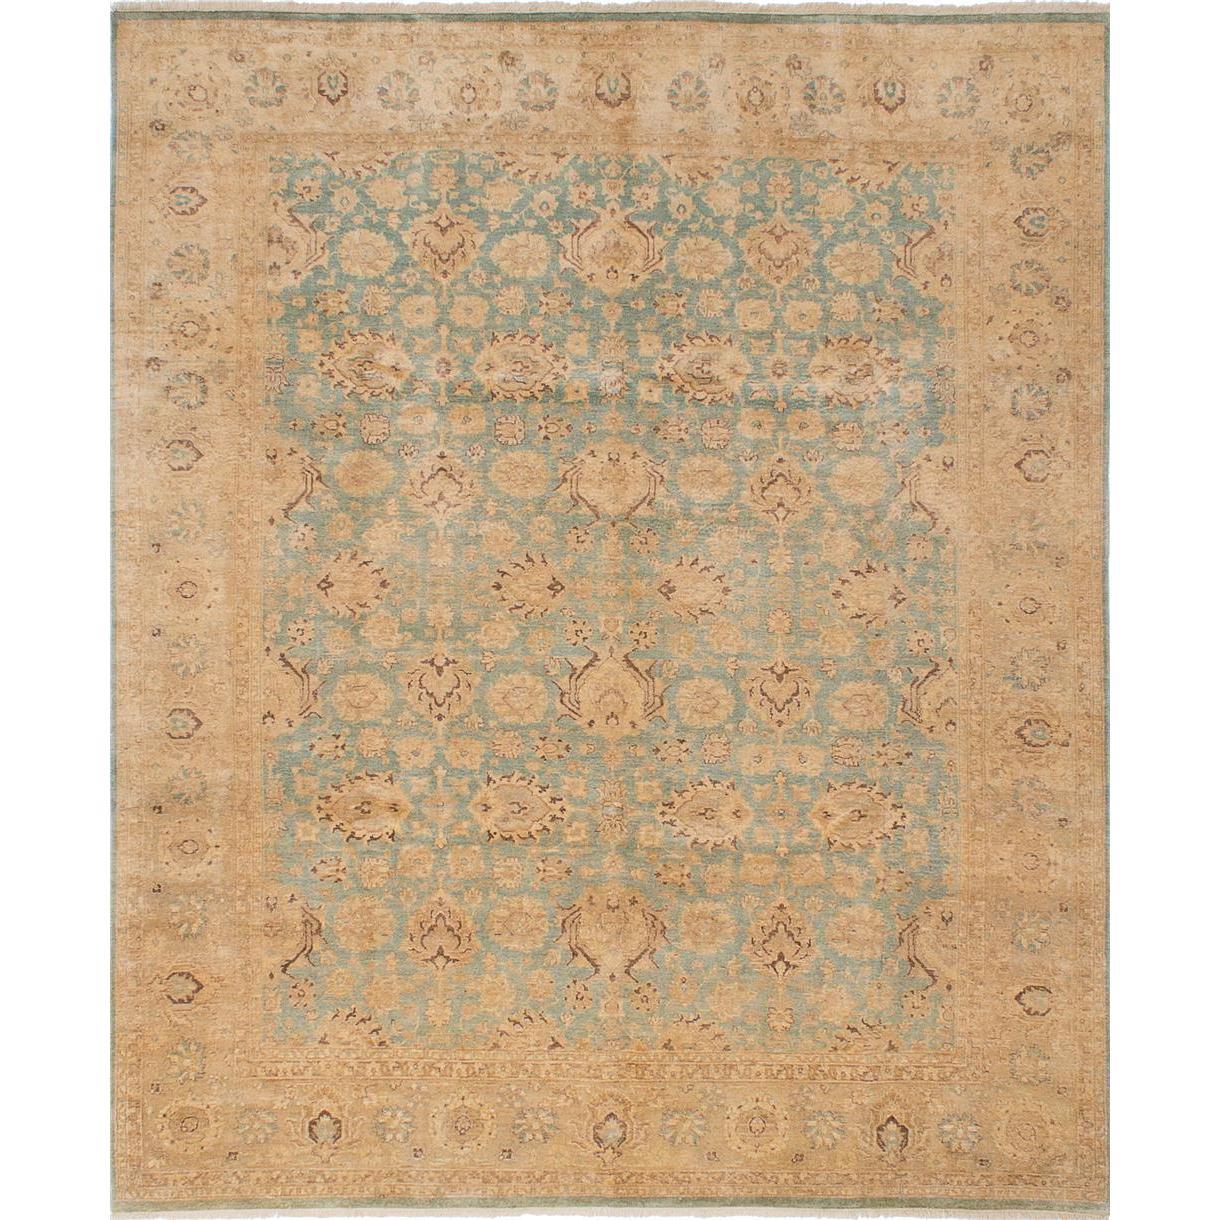 Ecarpetgallery Hand-knotted Peshawar Oushak Blue Wool Rug (8 x 97) (Blue Medium Weak Cyan Rug (8 x 9))